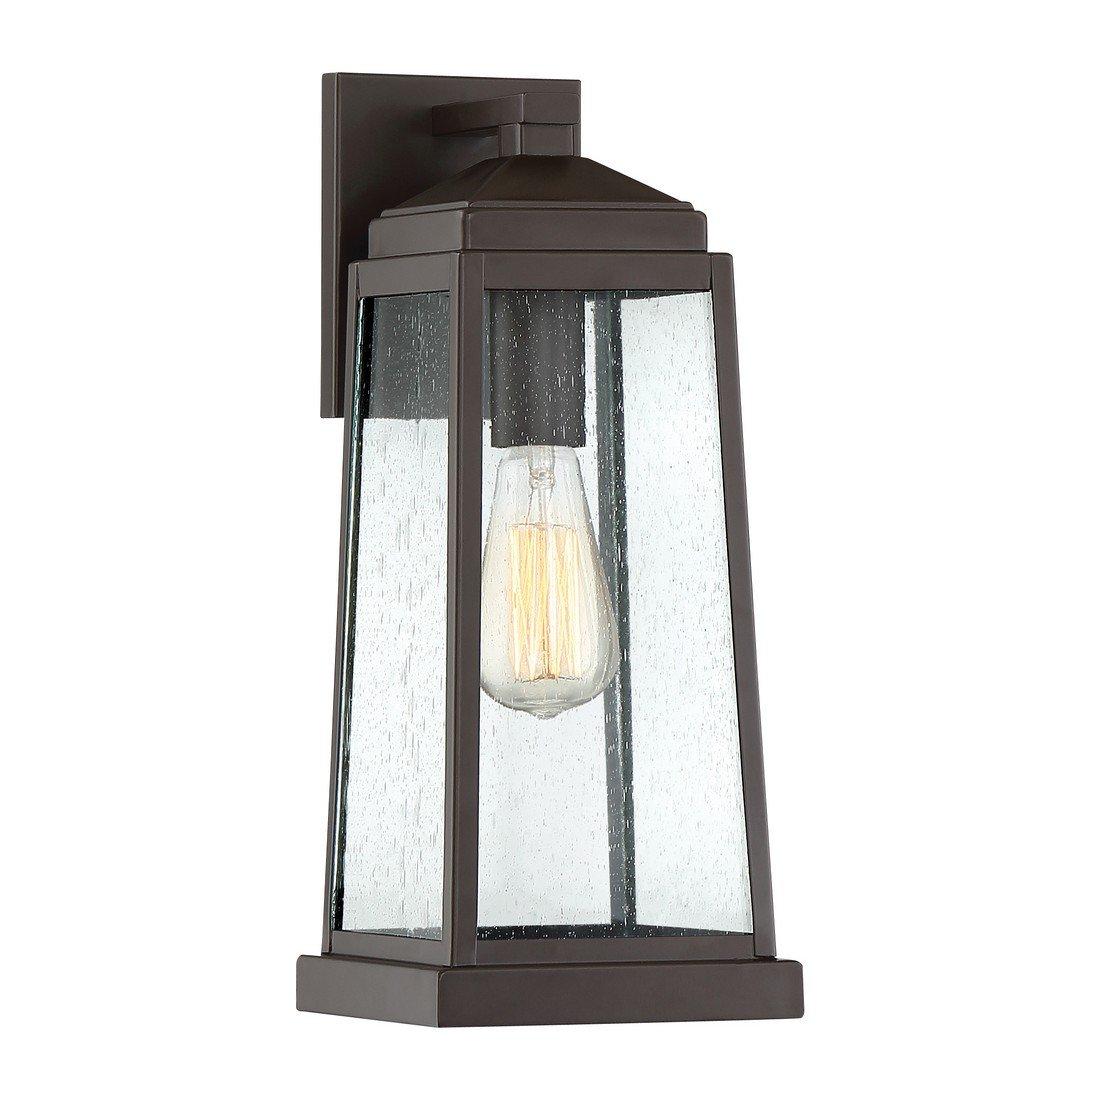 Quoizel RNL8407WT Ravenel Outdoor Lantern